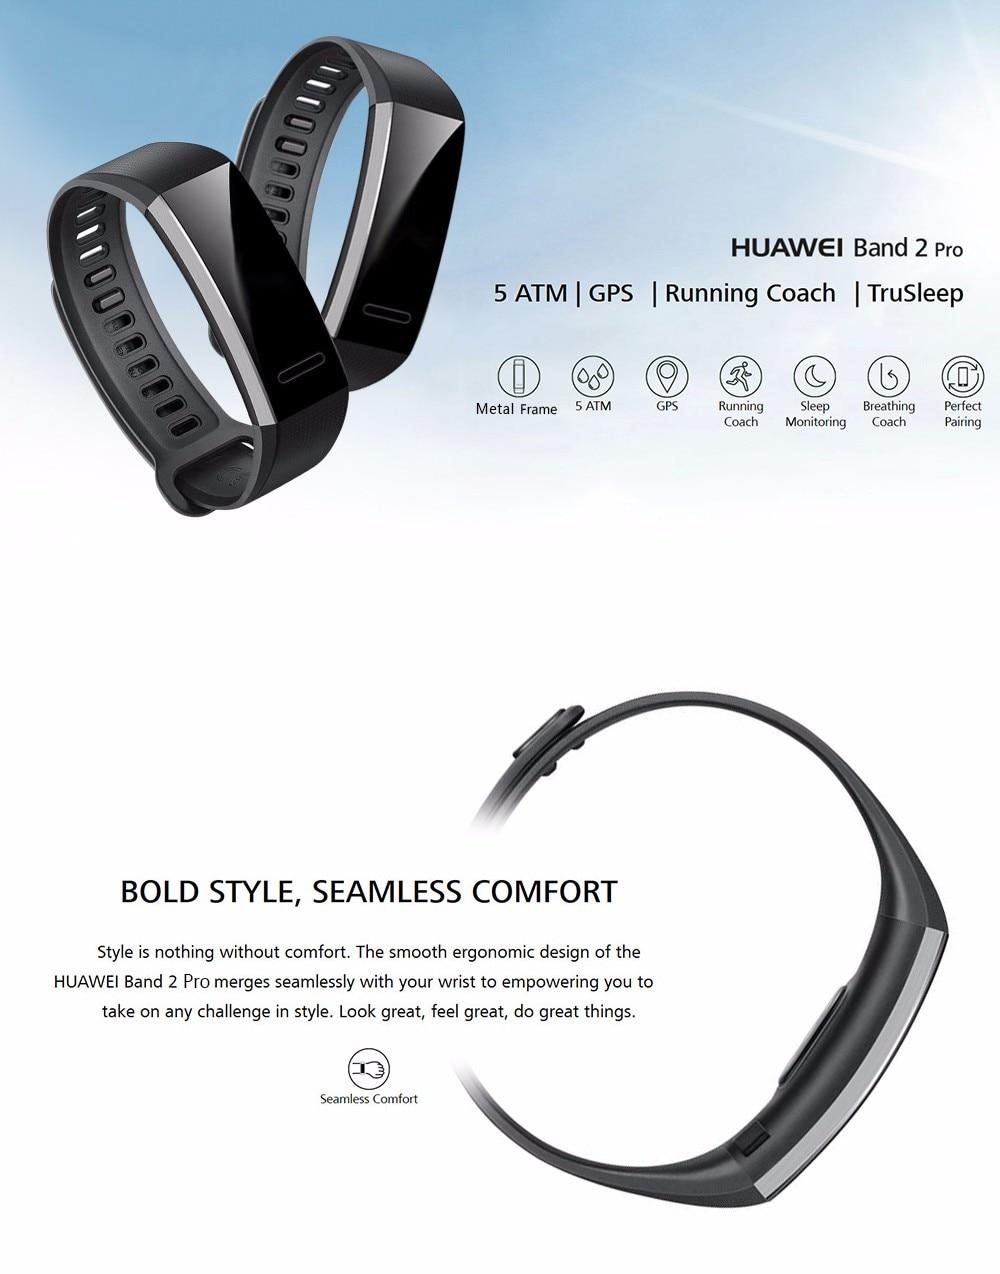 Huawei Band 2 Pro Review 2